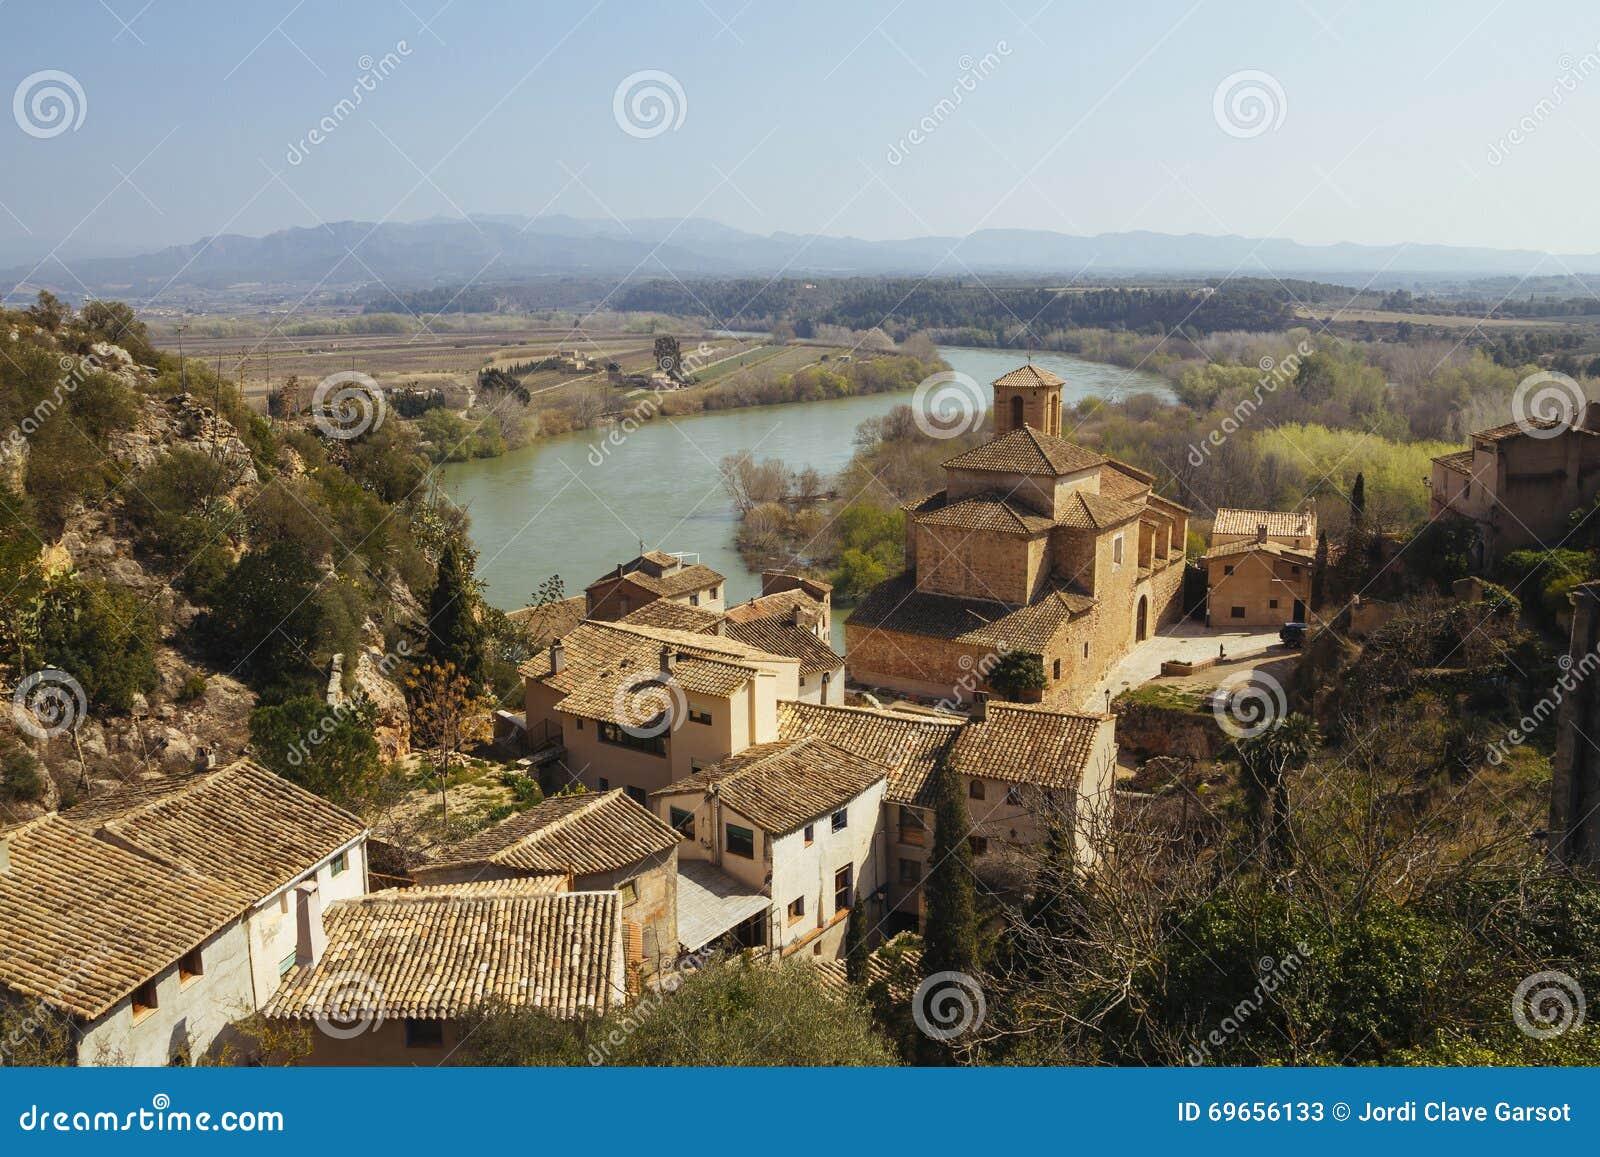 Miravet village in Catalunya, Spain